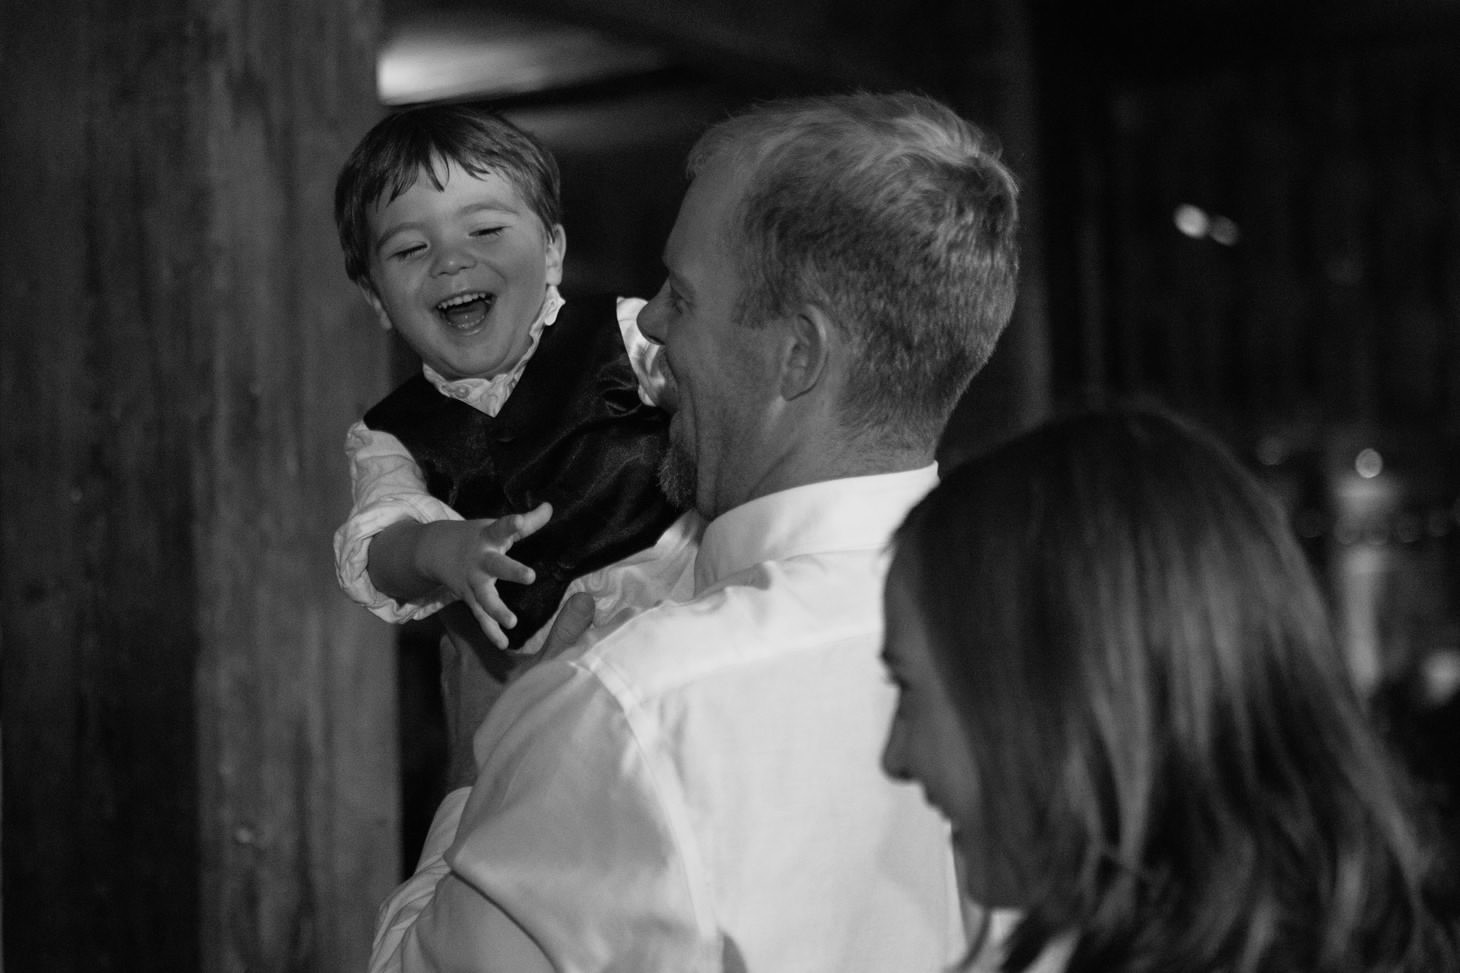 056-nyc-dumbo-loft-brooklyn-wedding-photographer-smitten-chickens-photo-.jpg